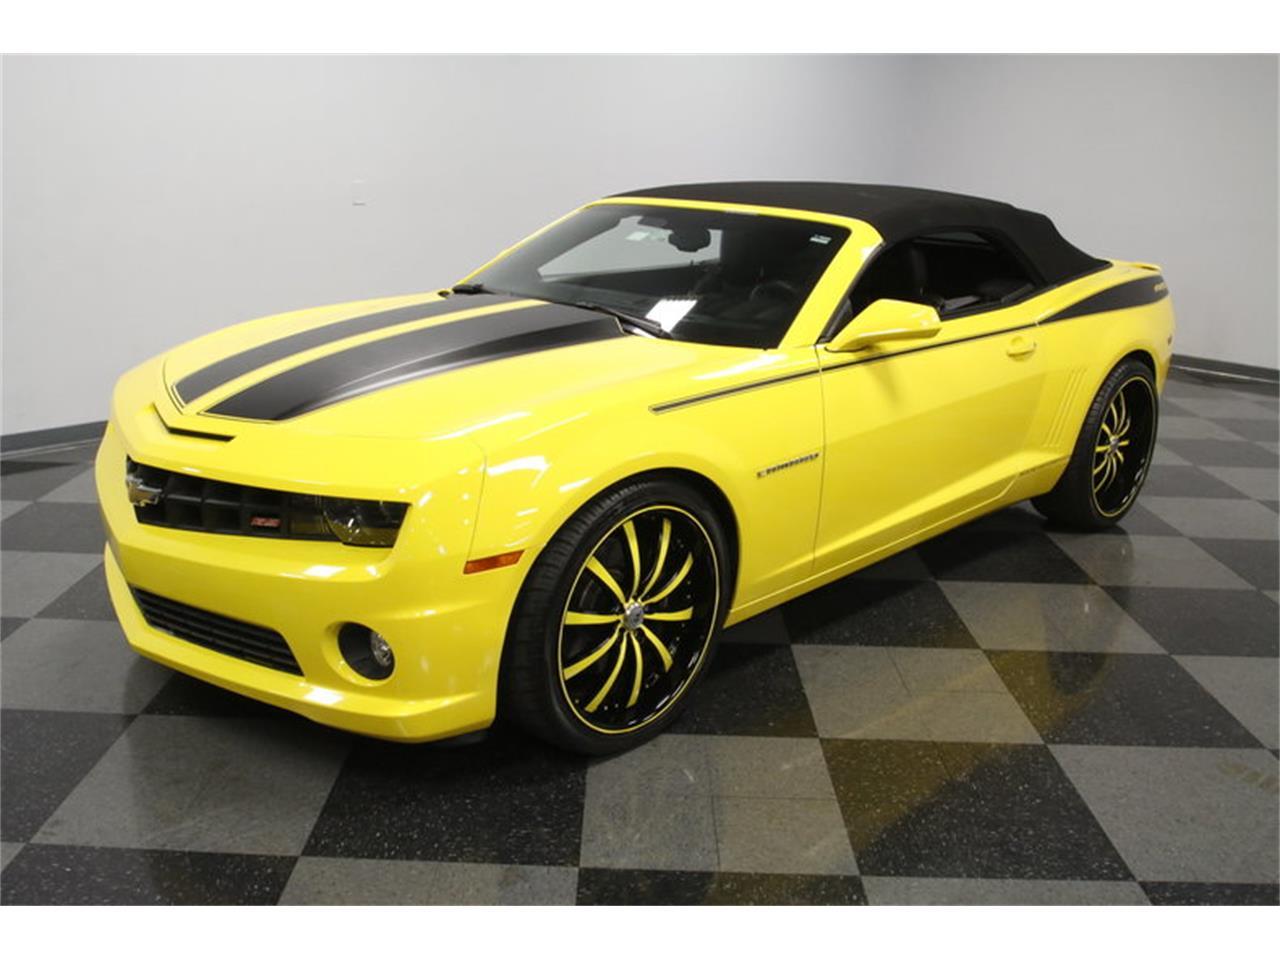 Large Picture of 2011 Camaro located in North Carolina - $34,995.00 - MZEP